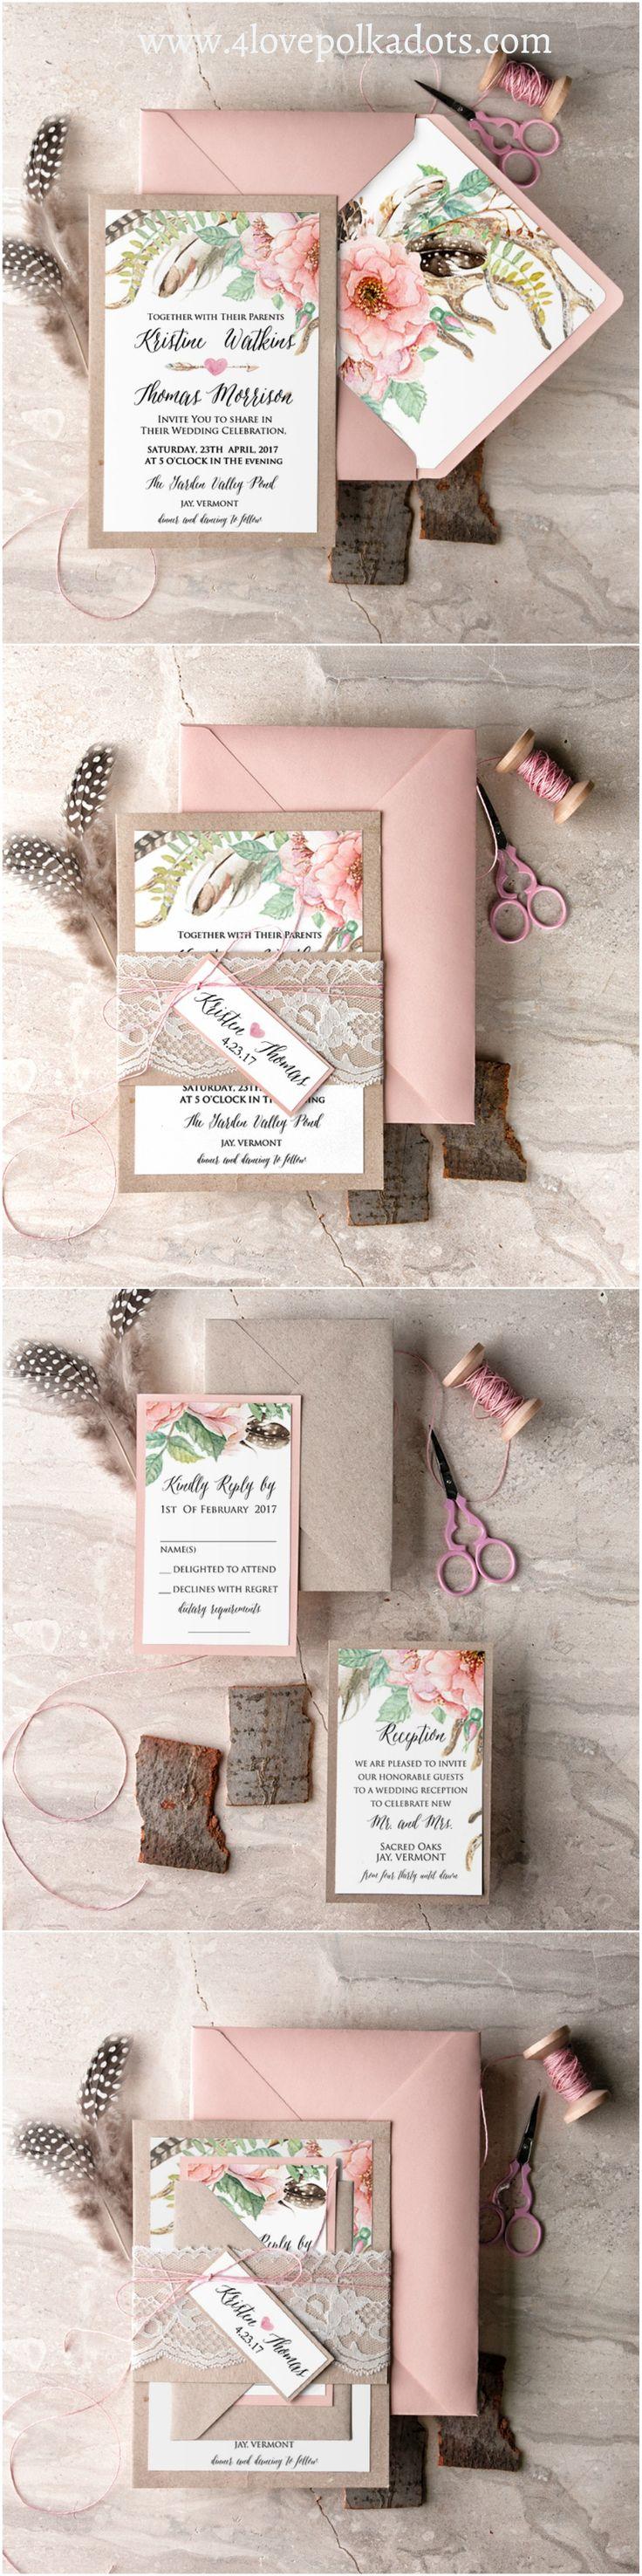 Wedding invitation 4lovepolkadots blush bohemianwedding weddinginvitations